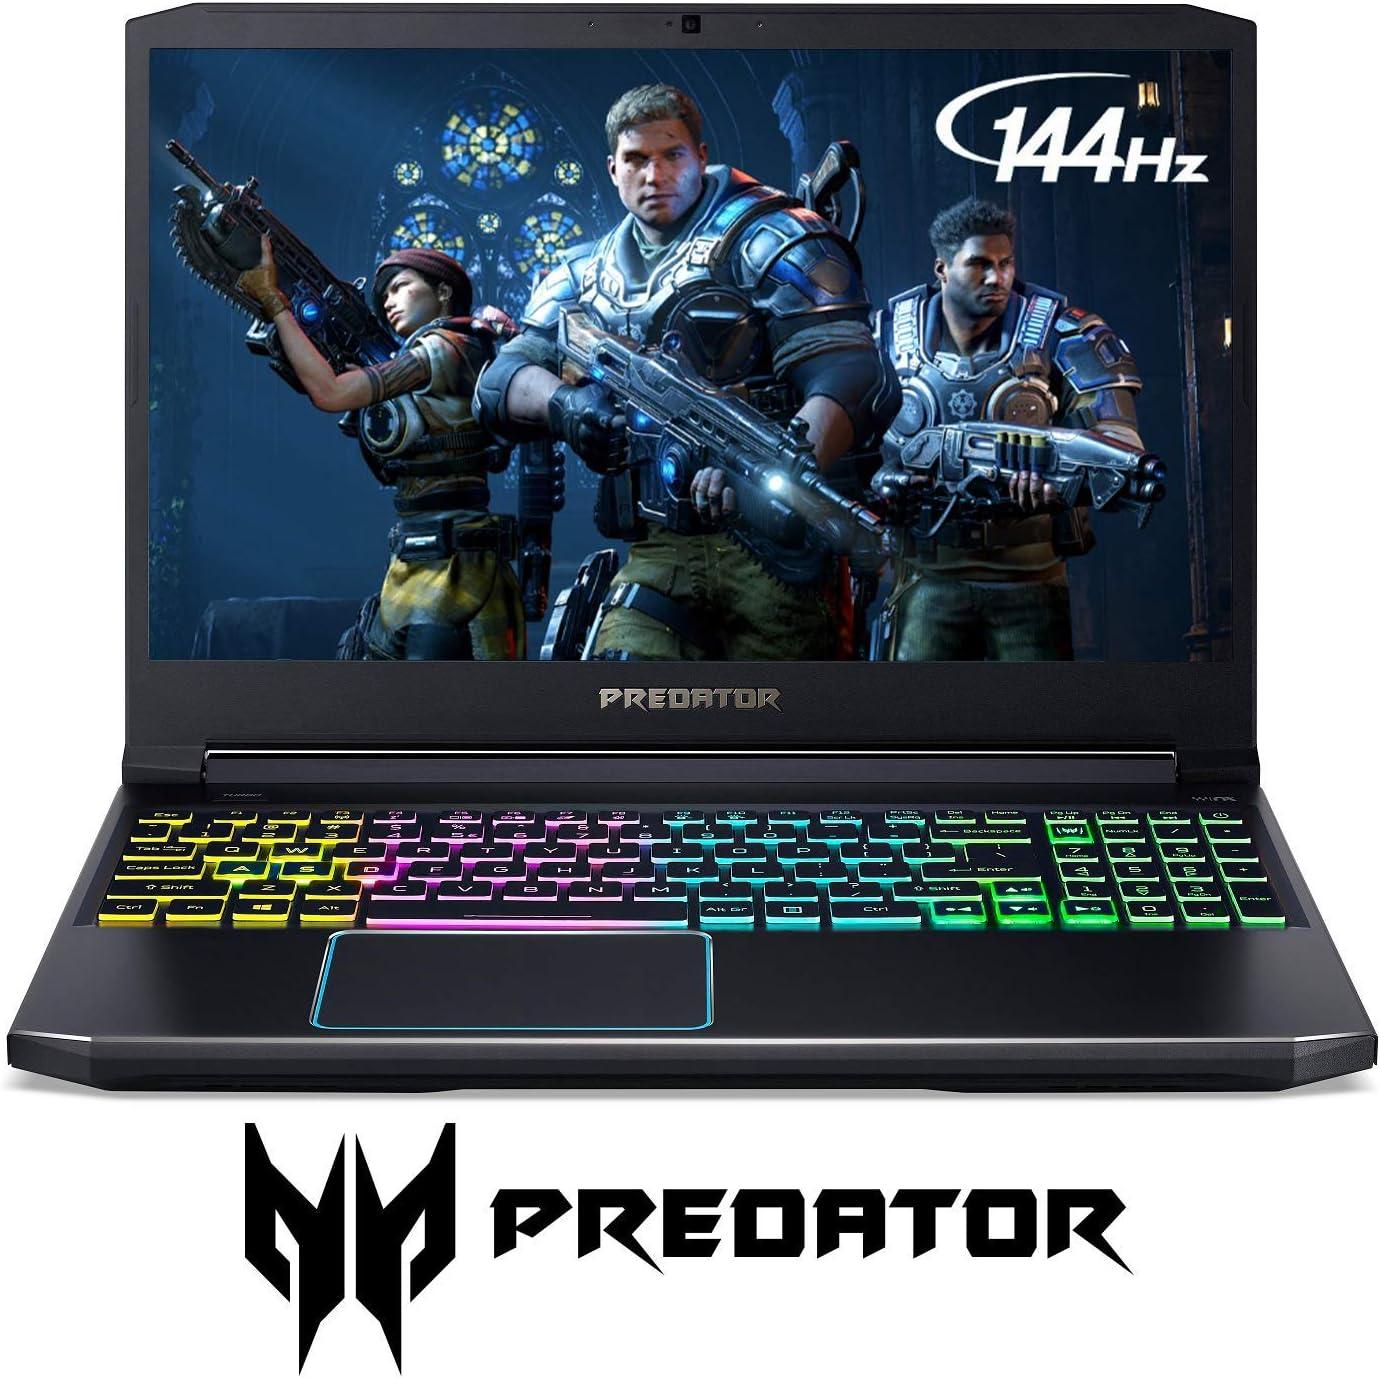 "Acer Predator Helios 300 - 15.6"" Intel i7-9750H 2.6GHz 16GB Ram 512GB SSD W10H (Renewed)"